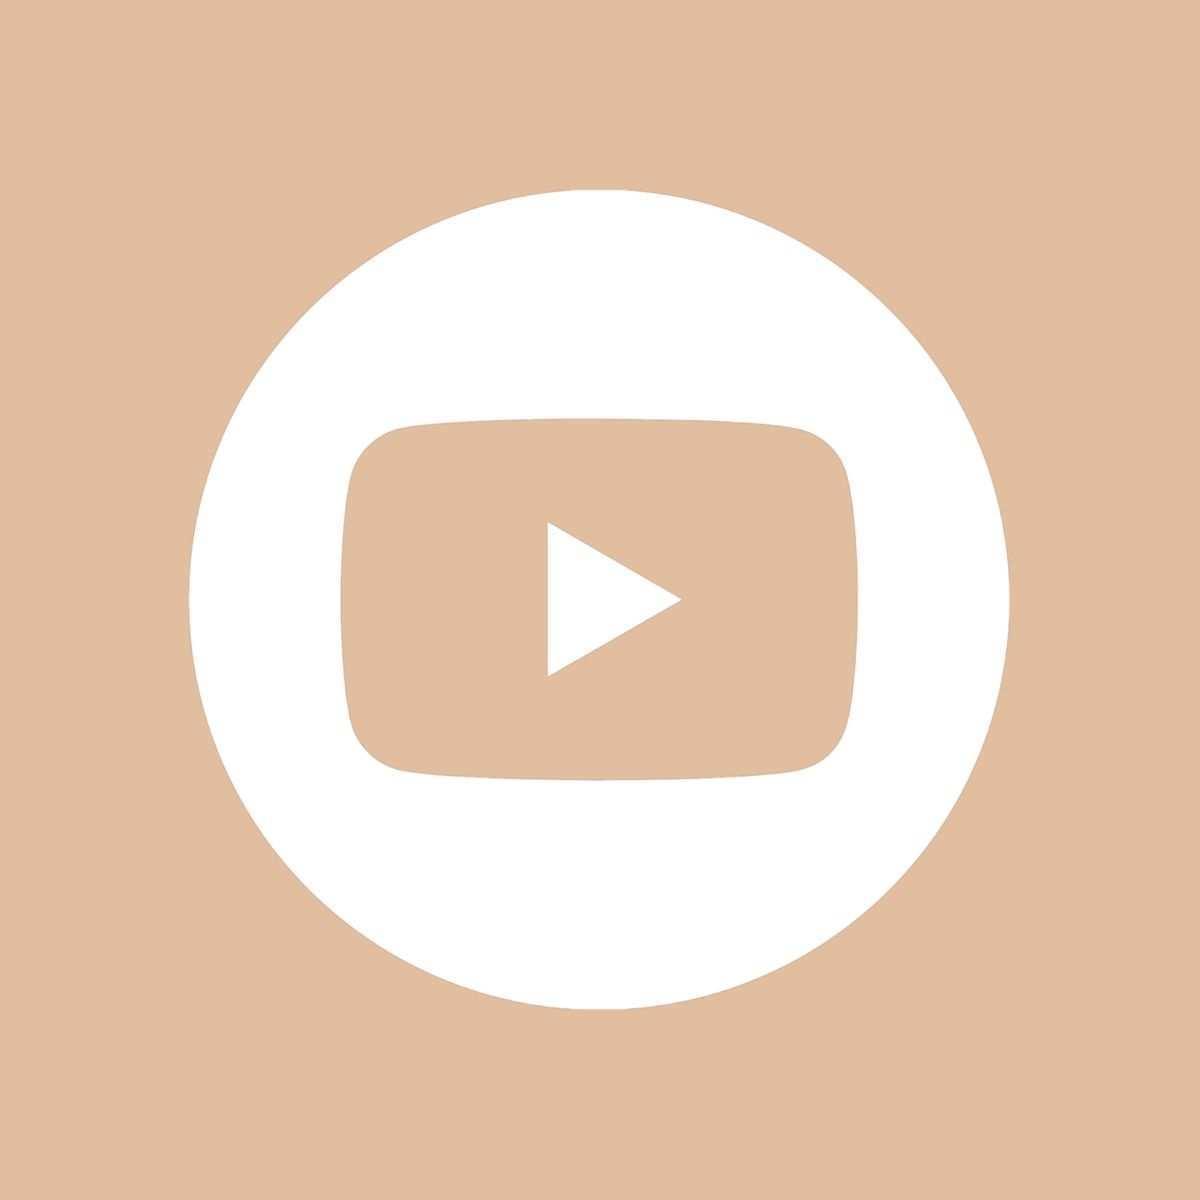 Youtube Icon Ios14 In 2020